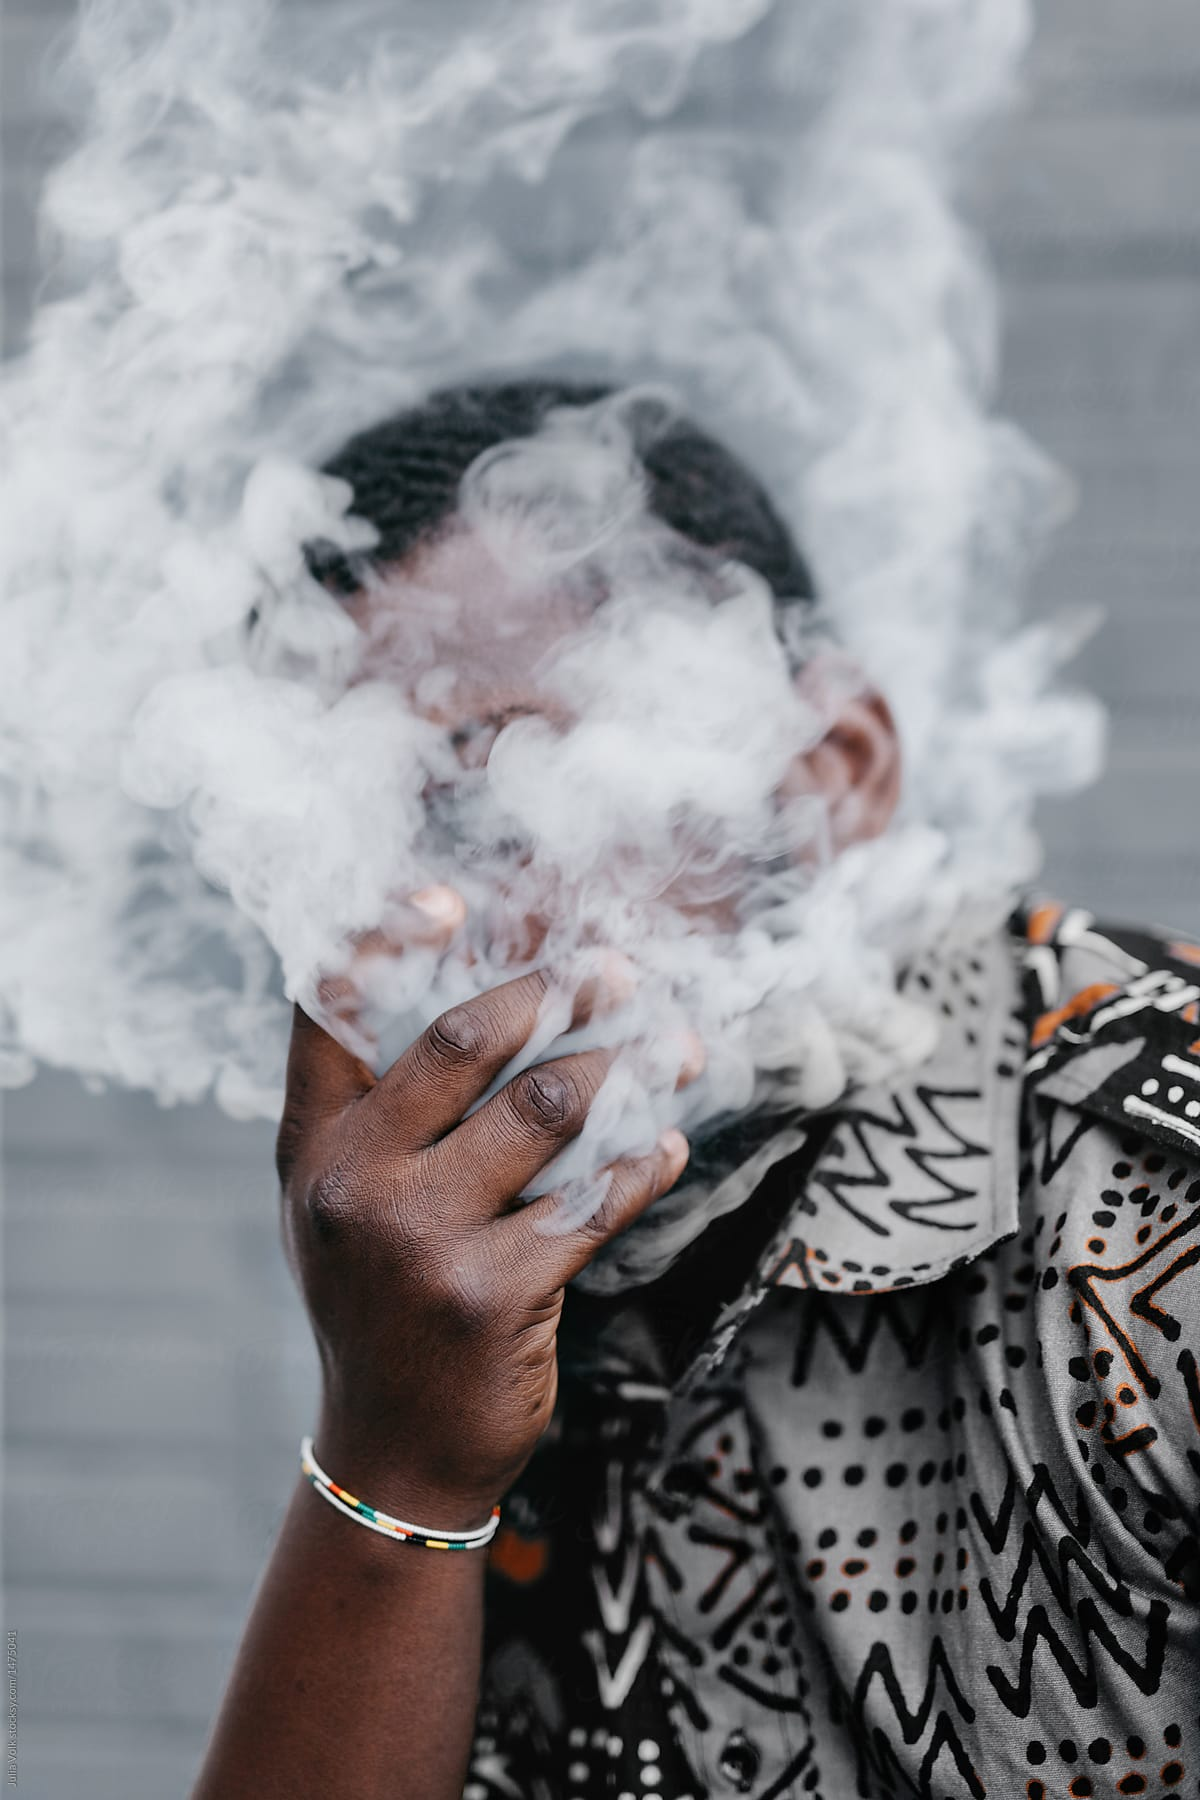 Secondhand smoke exposure tied to kidney disease